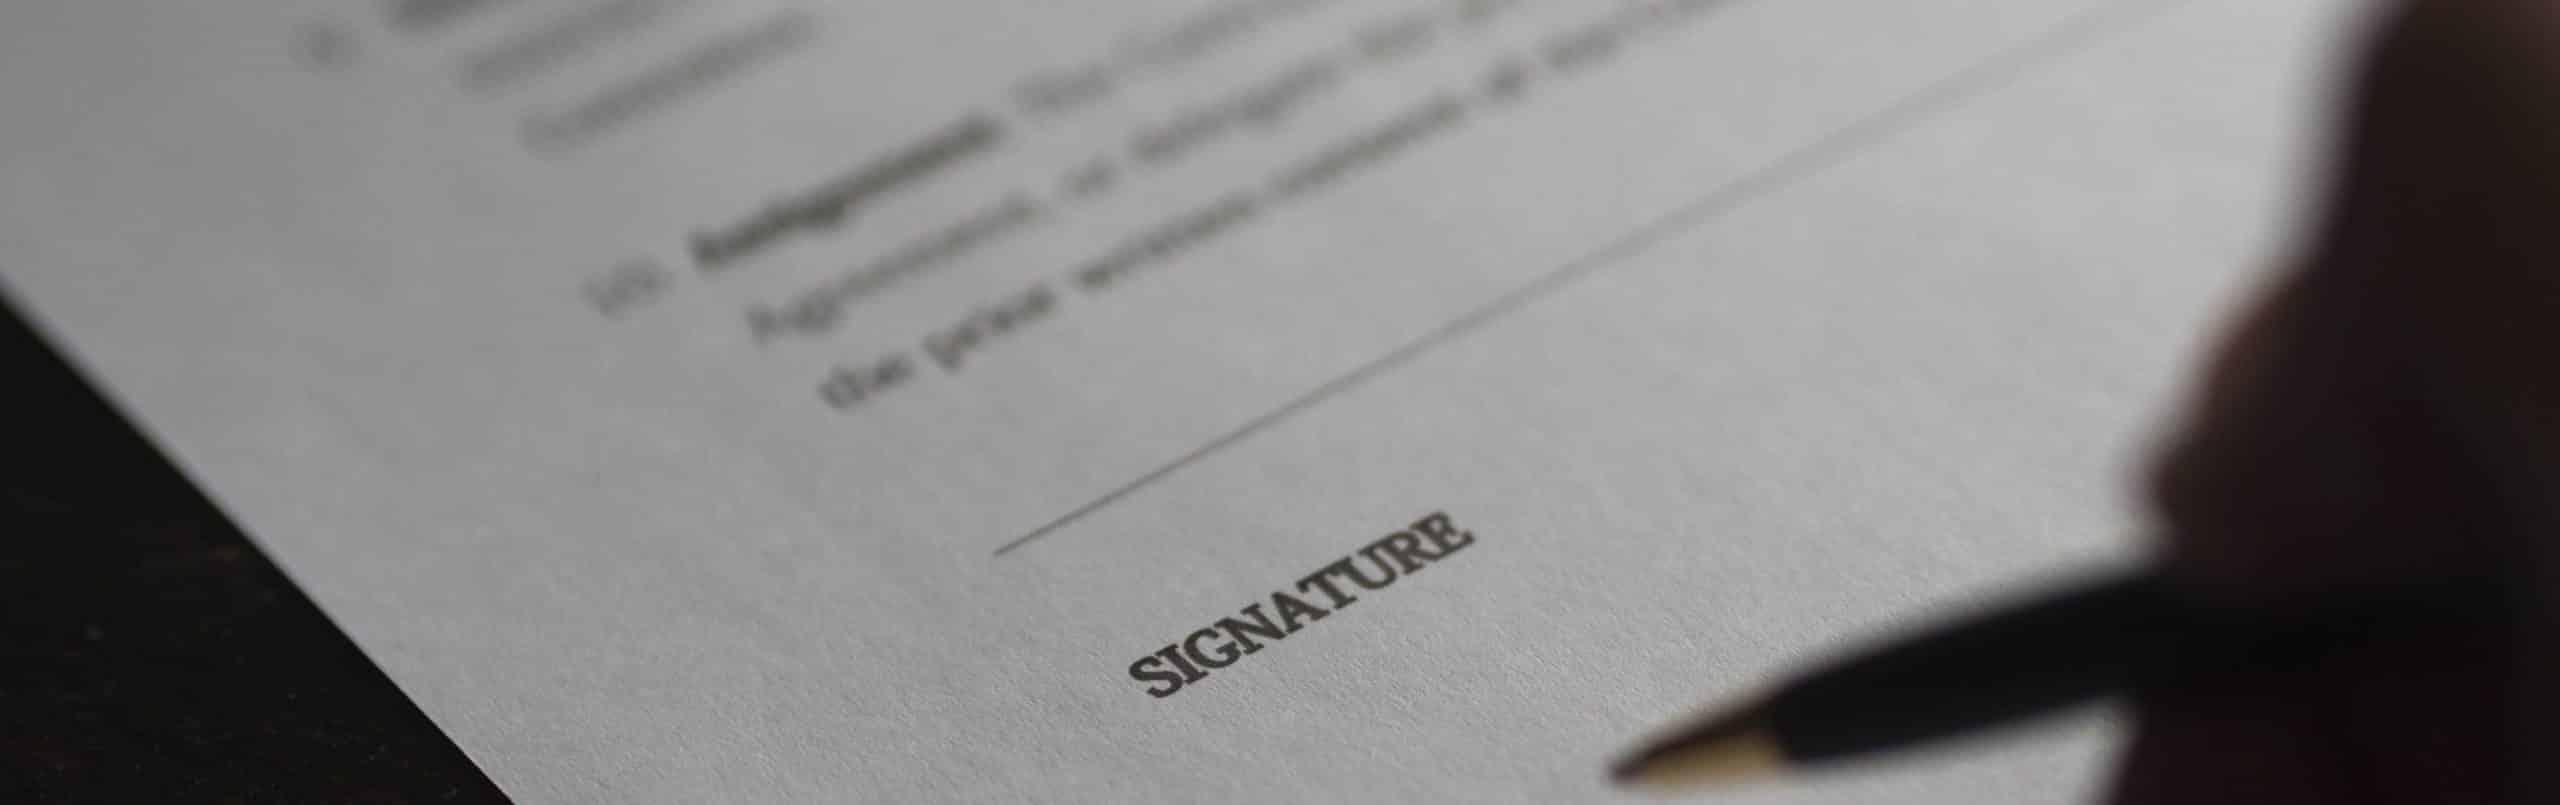 Update: Colorado License Renewal Certificate 1